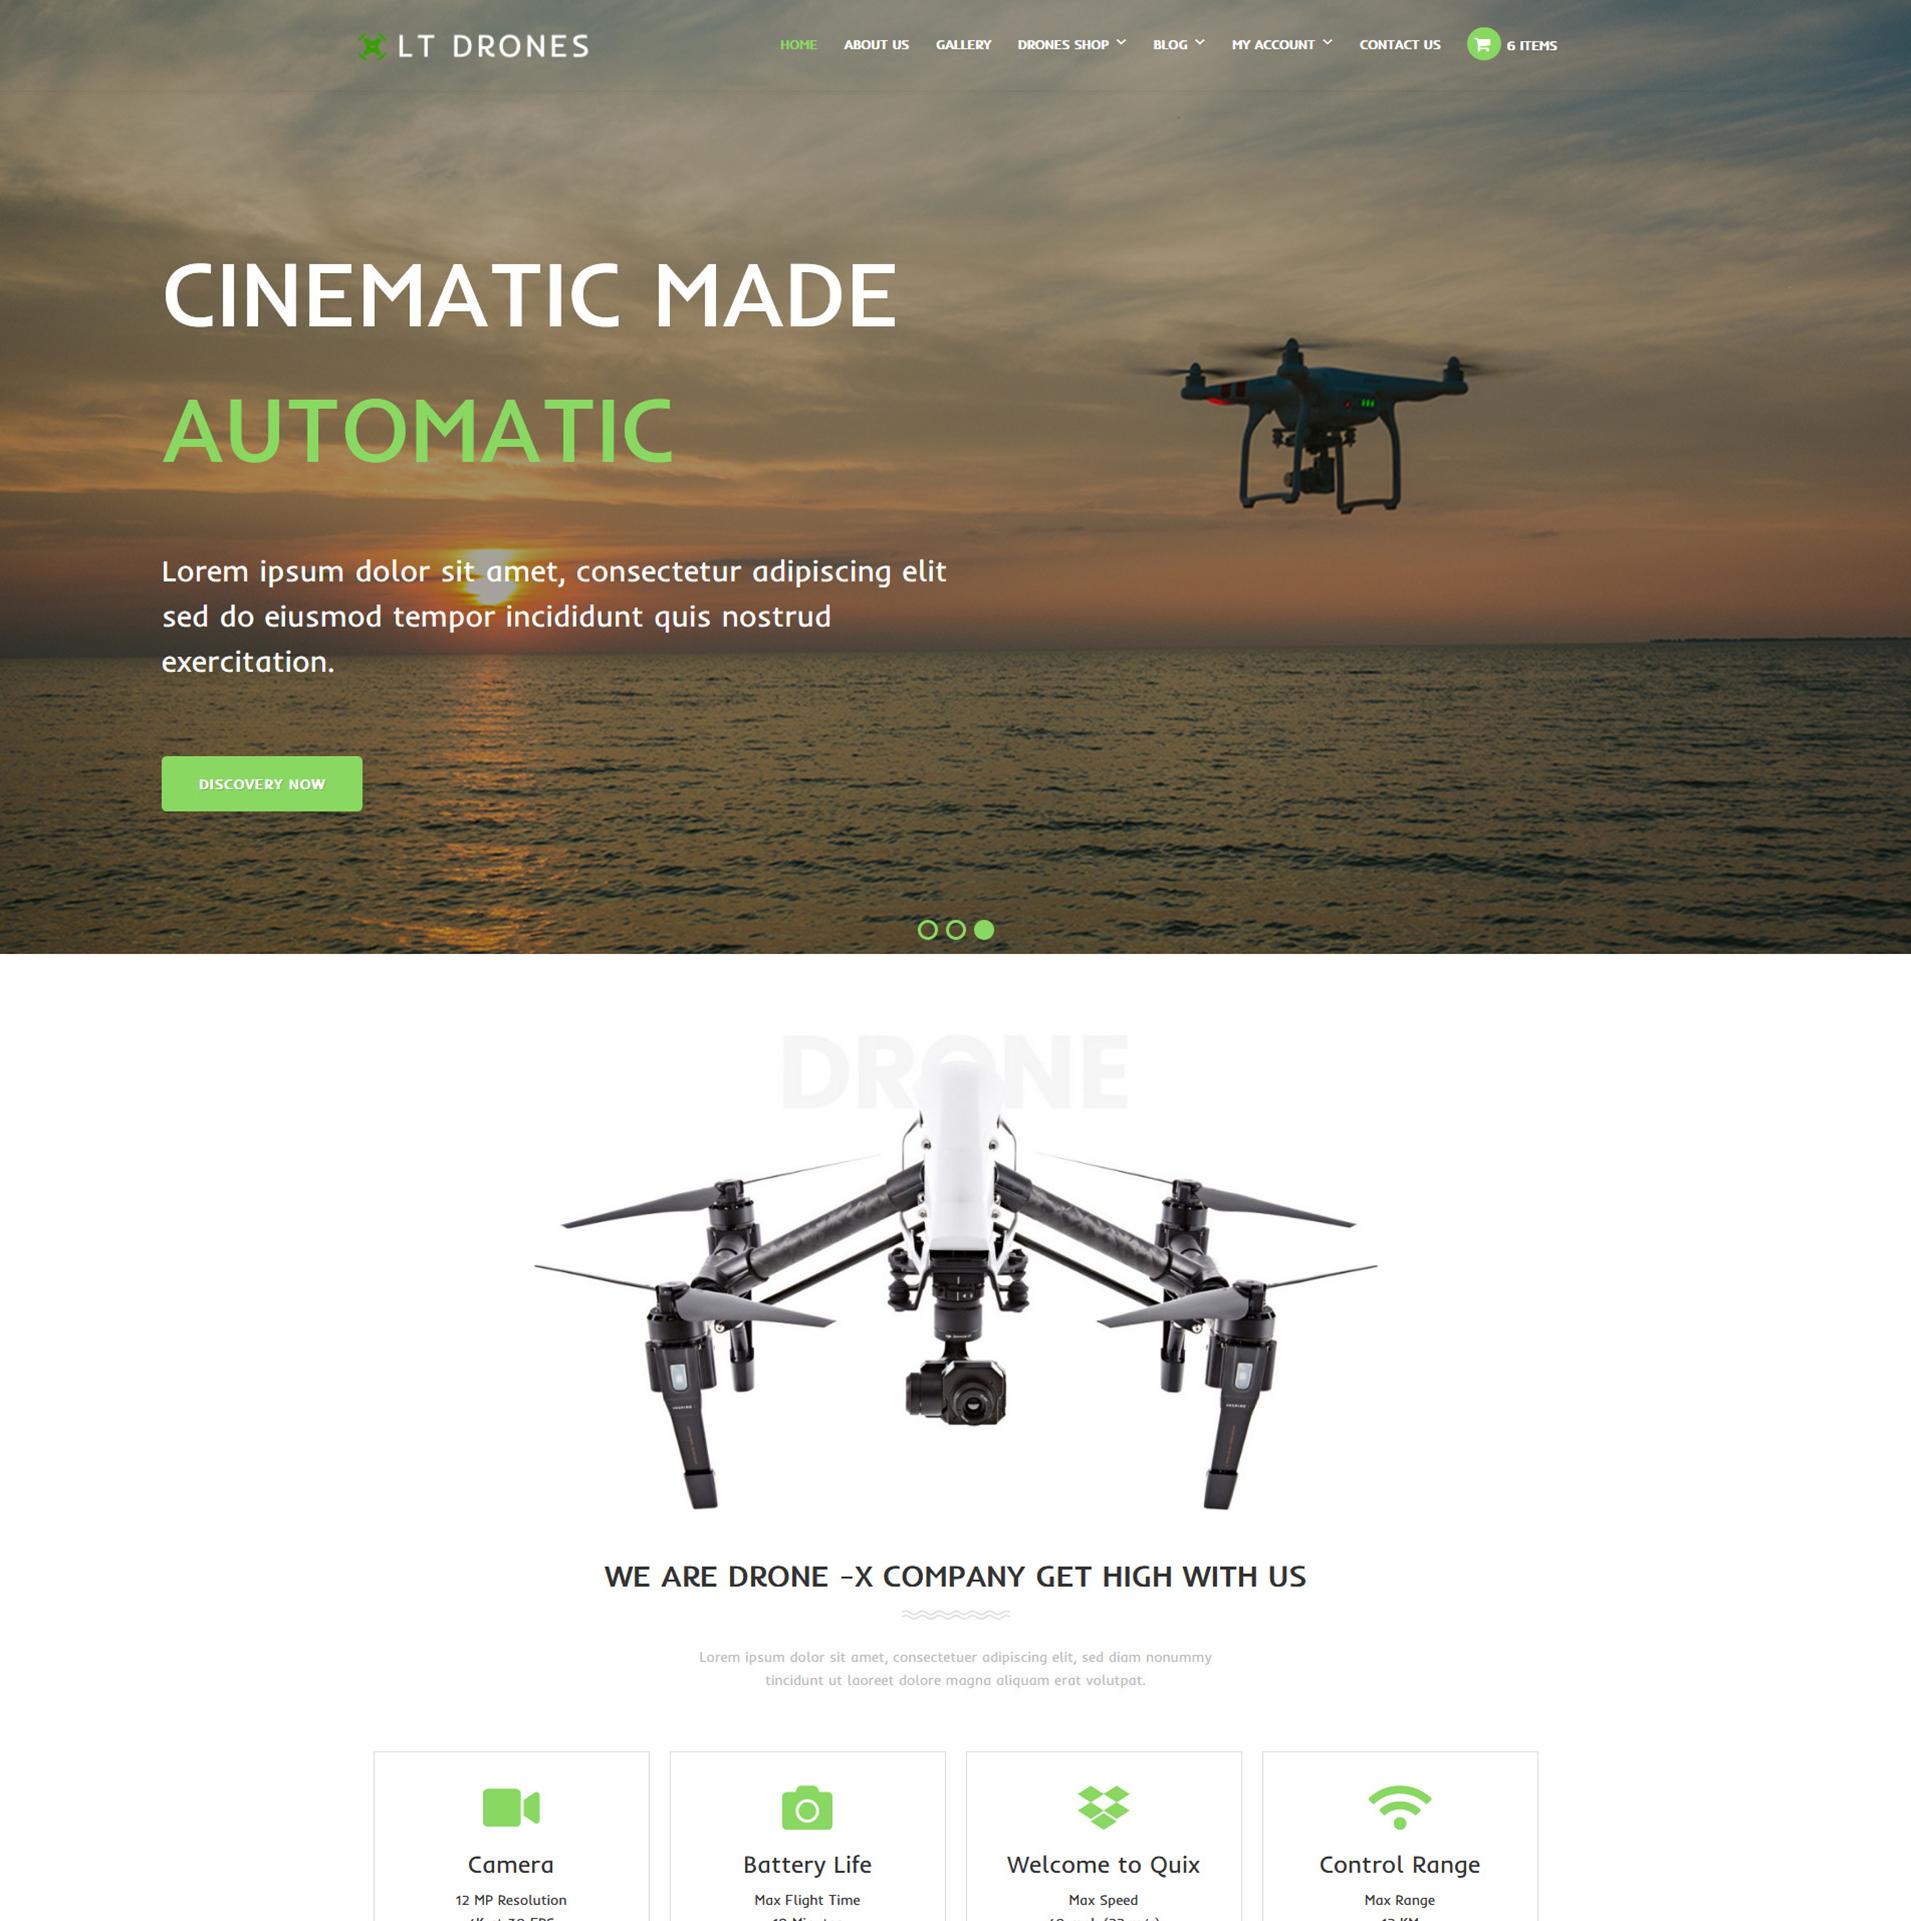 lt-drones-screenhot